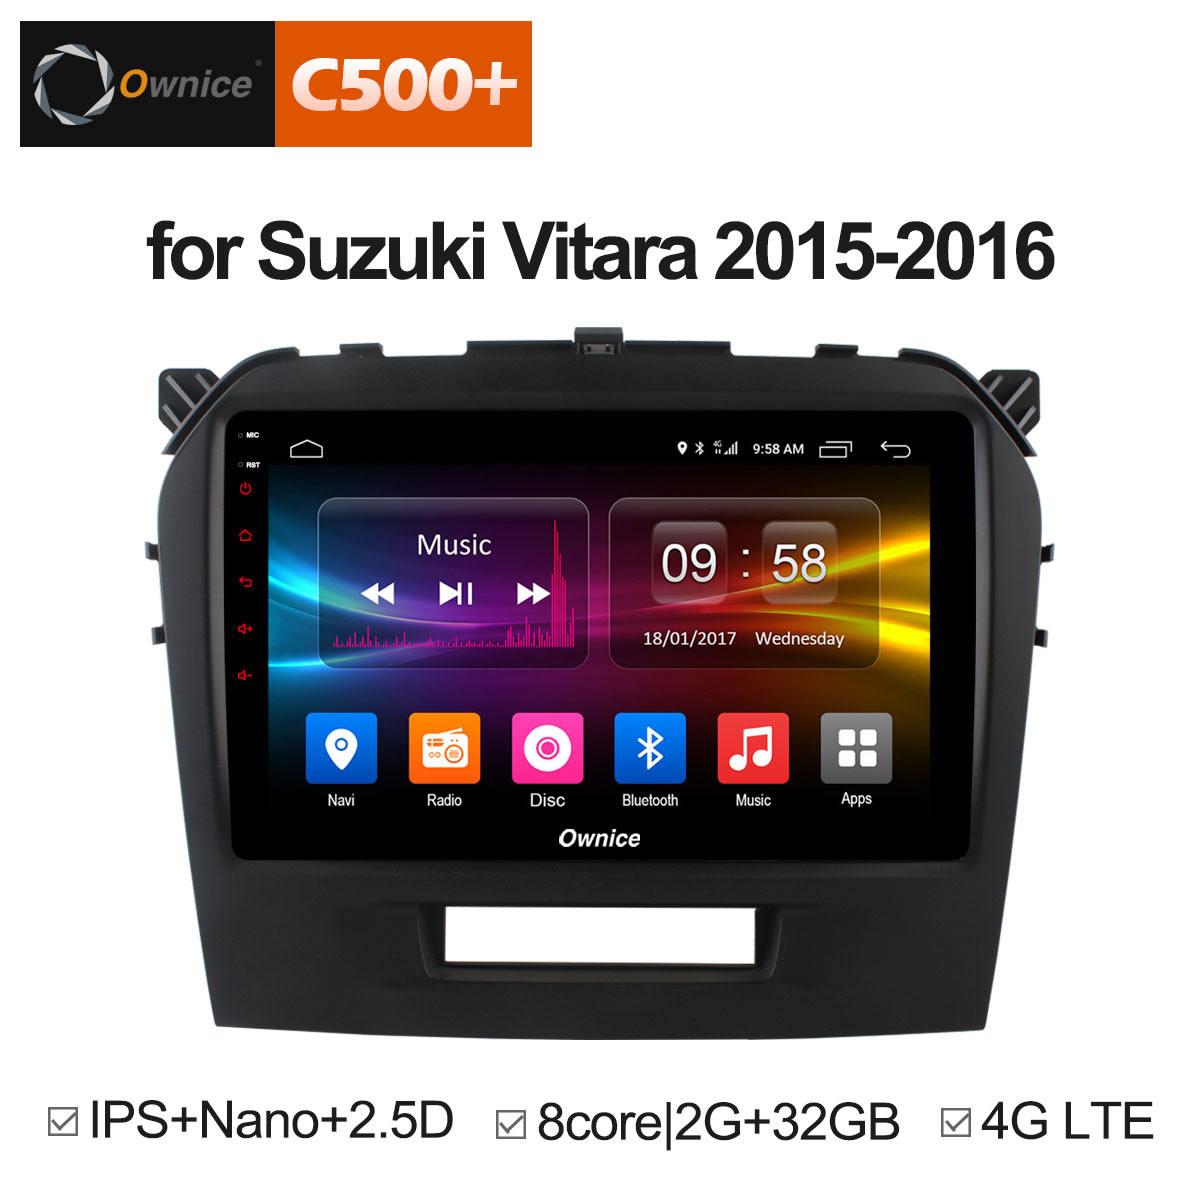 Штатная магнитола CARMEDIA OL-9621-8 (C500+) Suzuki Vitara 2015+